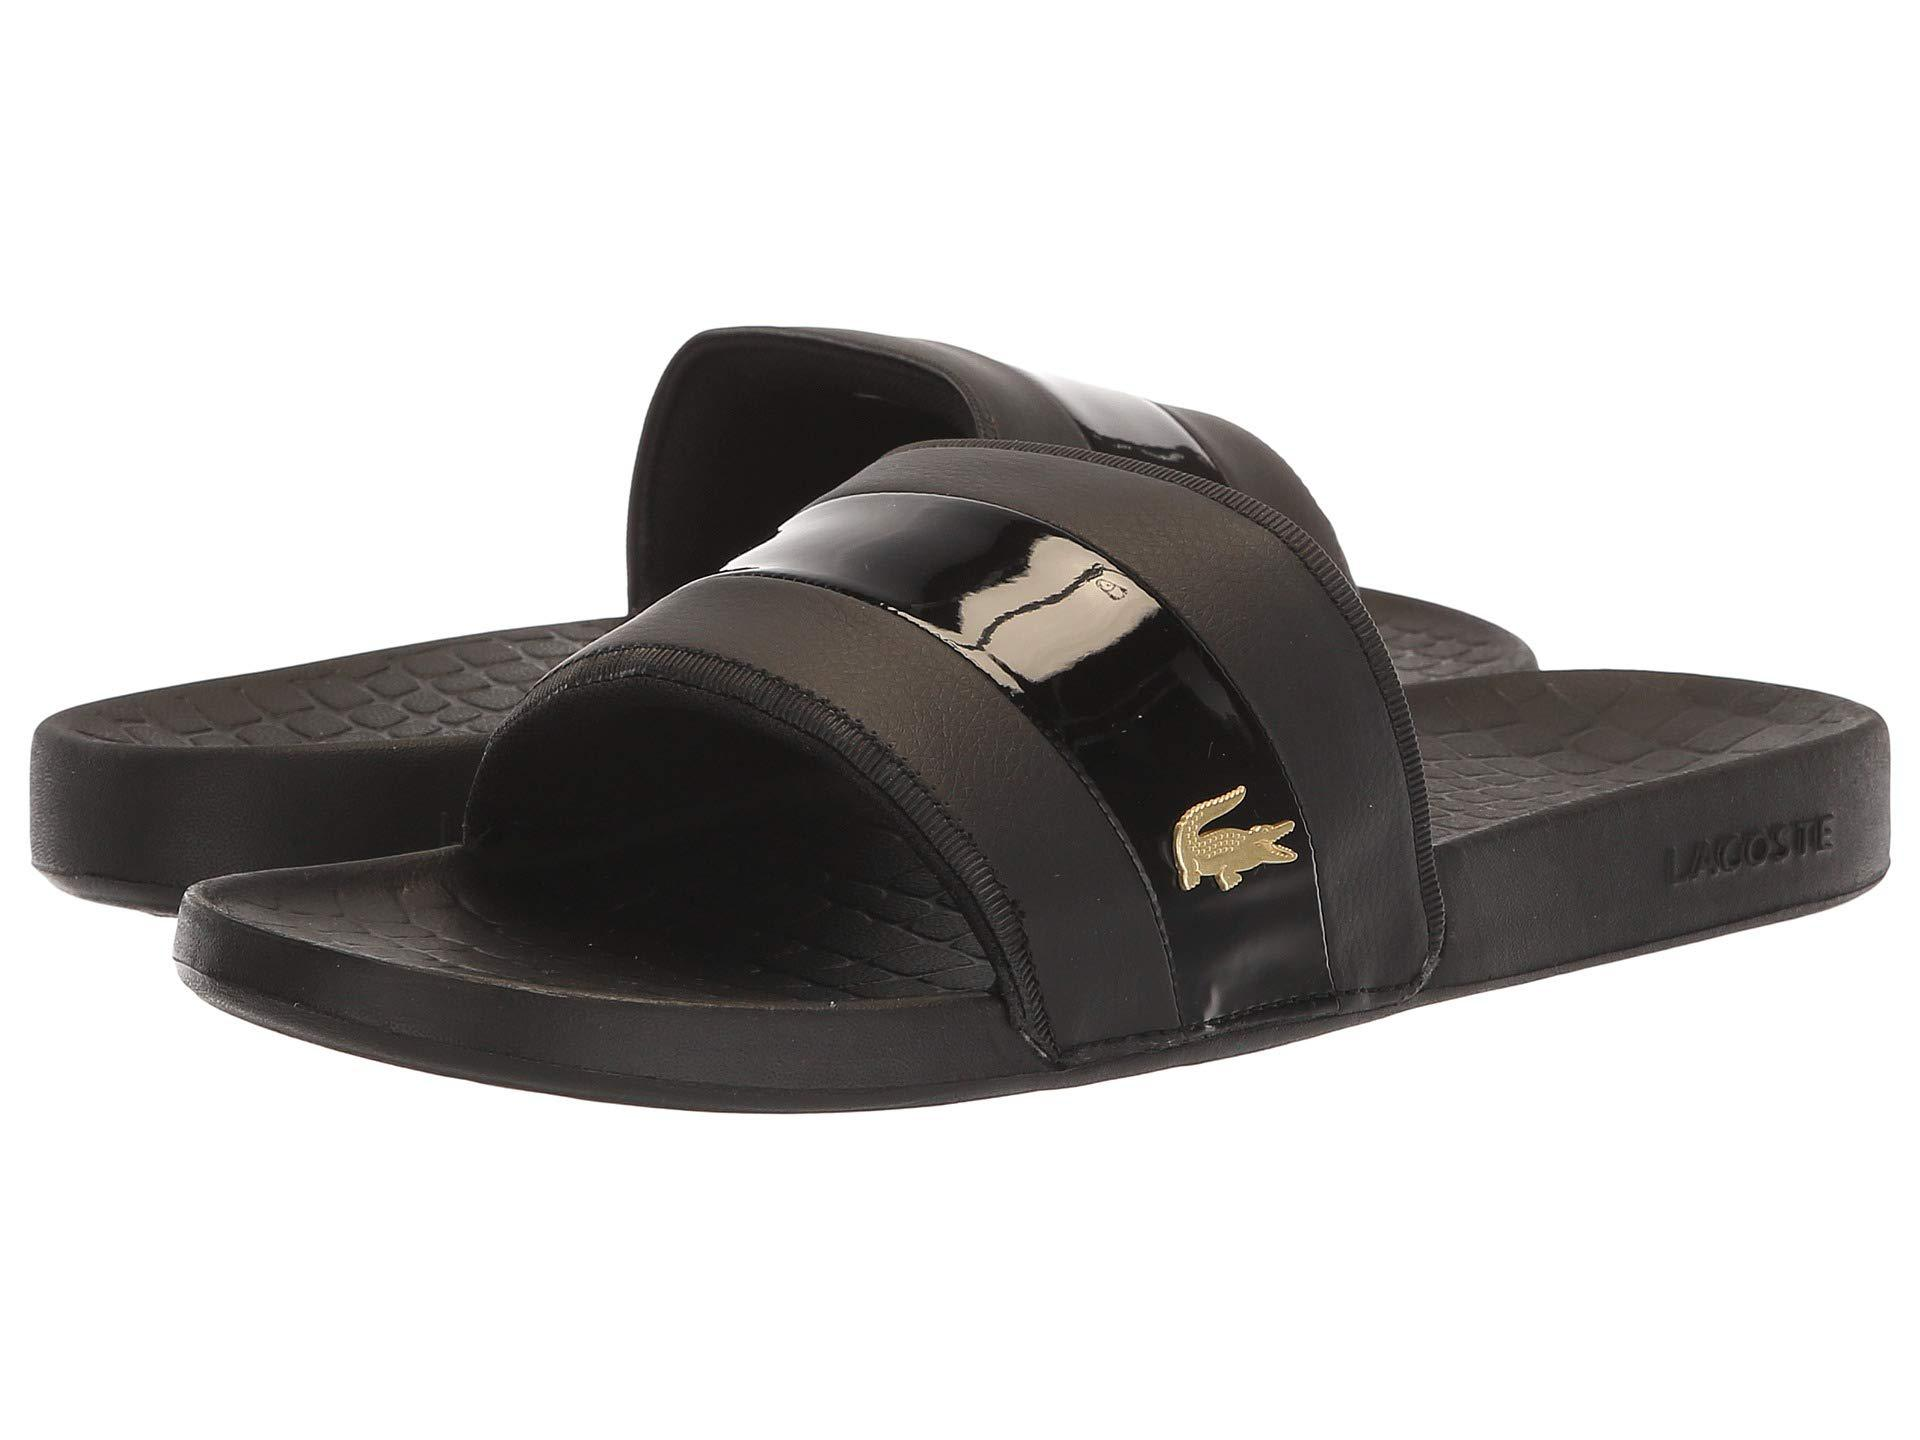 412f230b4a1d8 Lacoste - Black Fraisier 118 1 U (green gold) Men s Shoes for Men. View  fullscreen